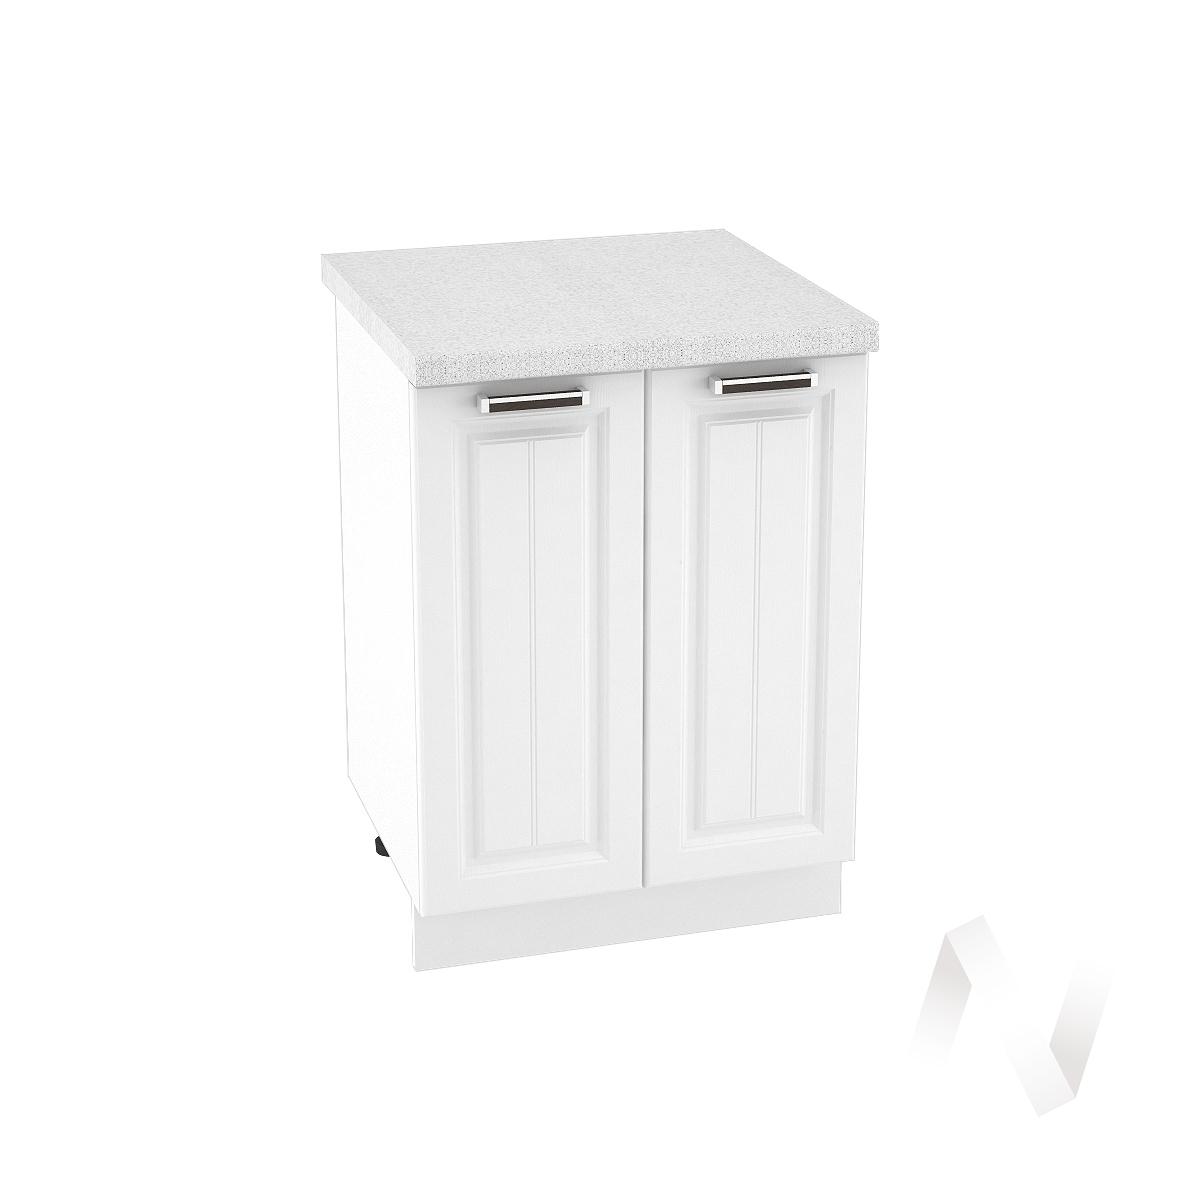 "Кухня ""Прага"": Шкаф нижний 600, ШН 600 (белое дерево/корпус белый)"